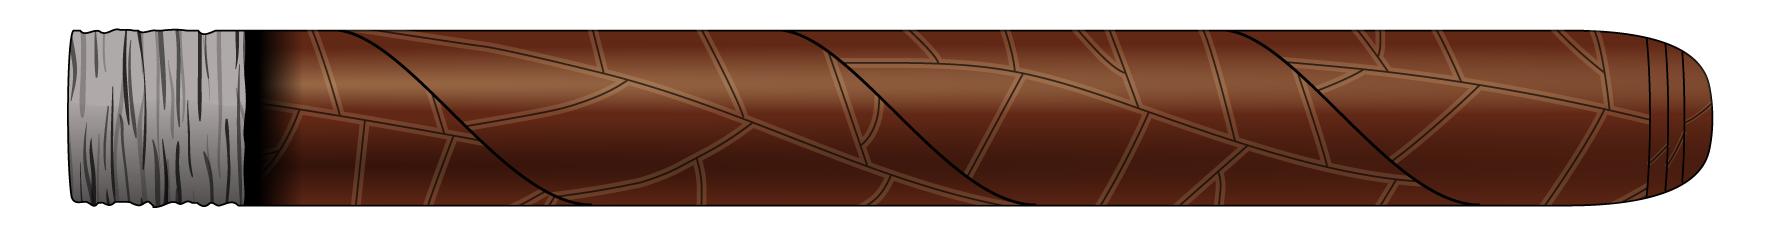 Cigar Silo Banner